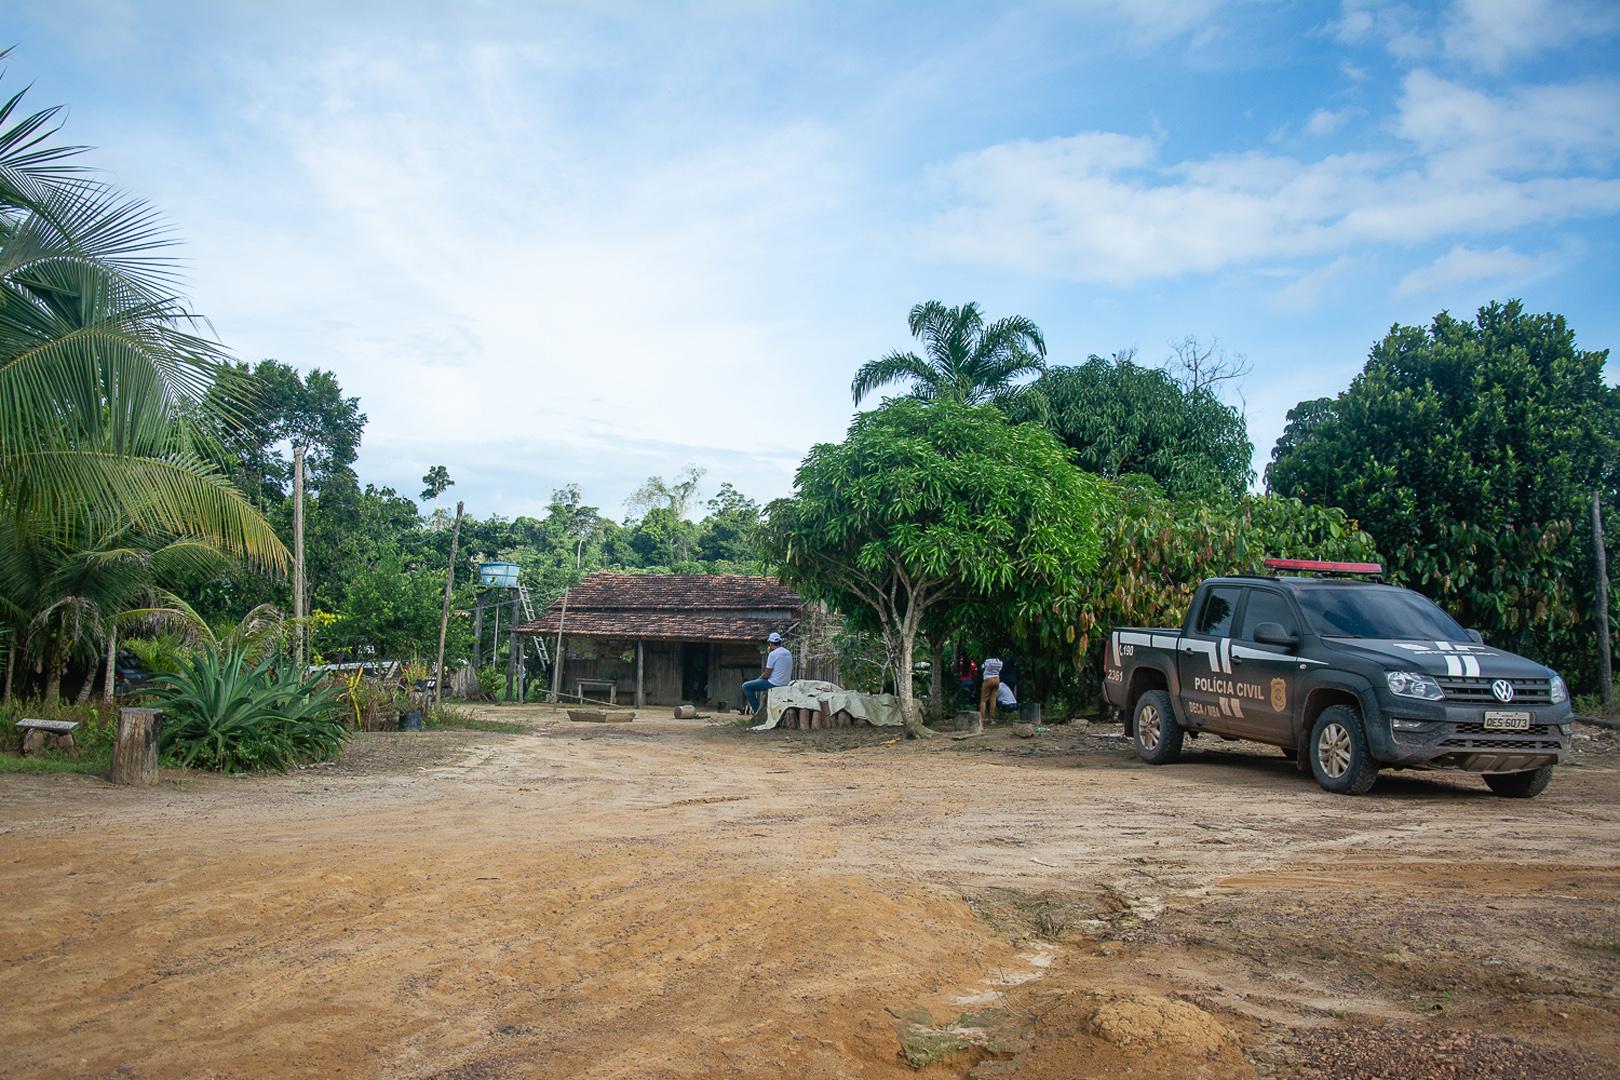 Polícia prende fazendeiro acusado de suposto mandante de seis mortes, entre elas, da ativista Dilma Silva, no Pará